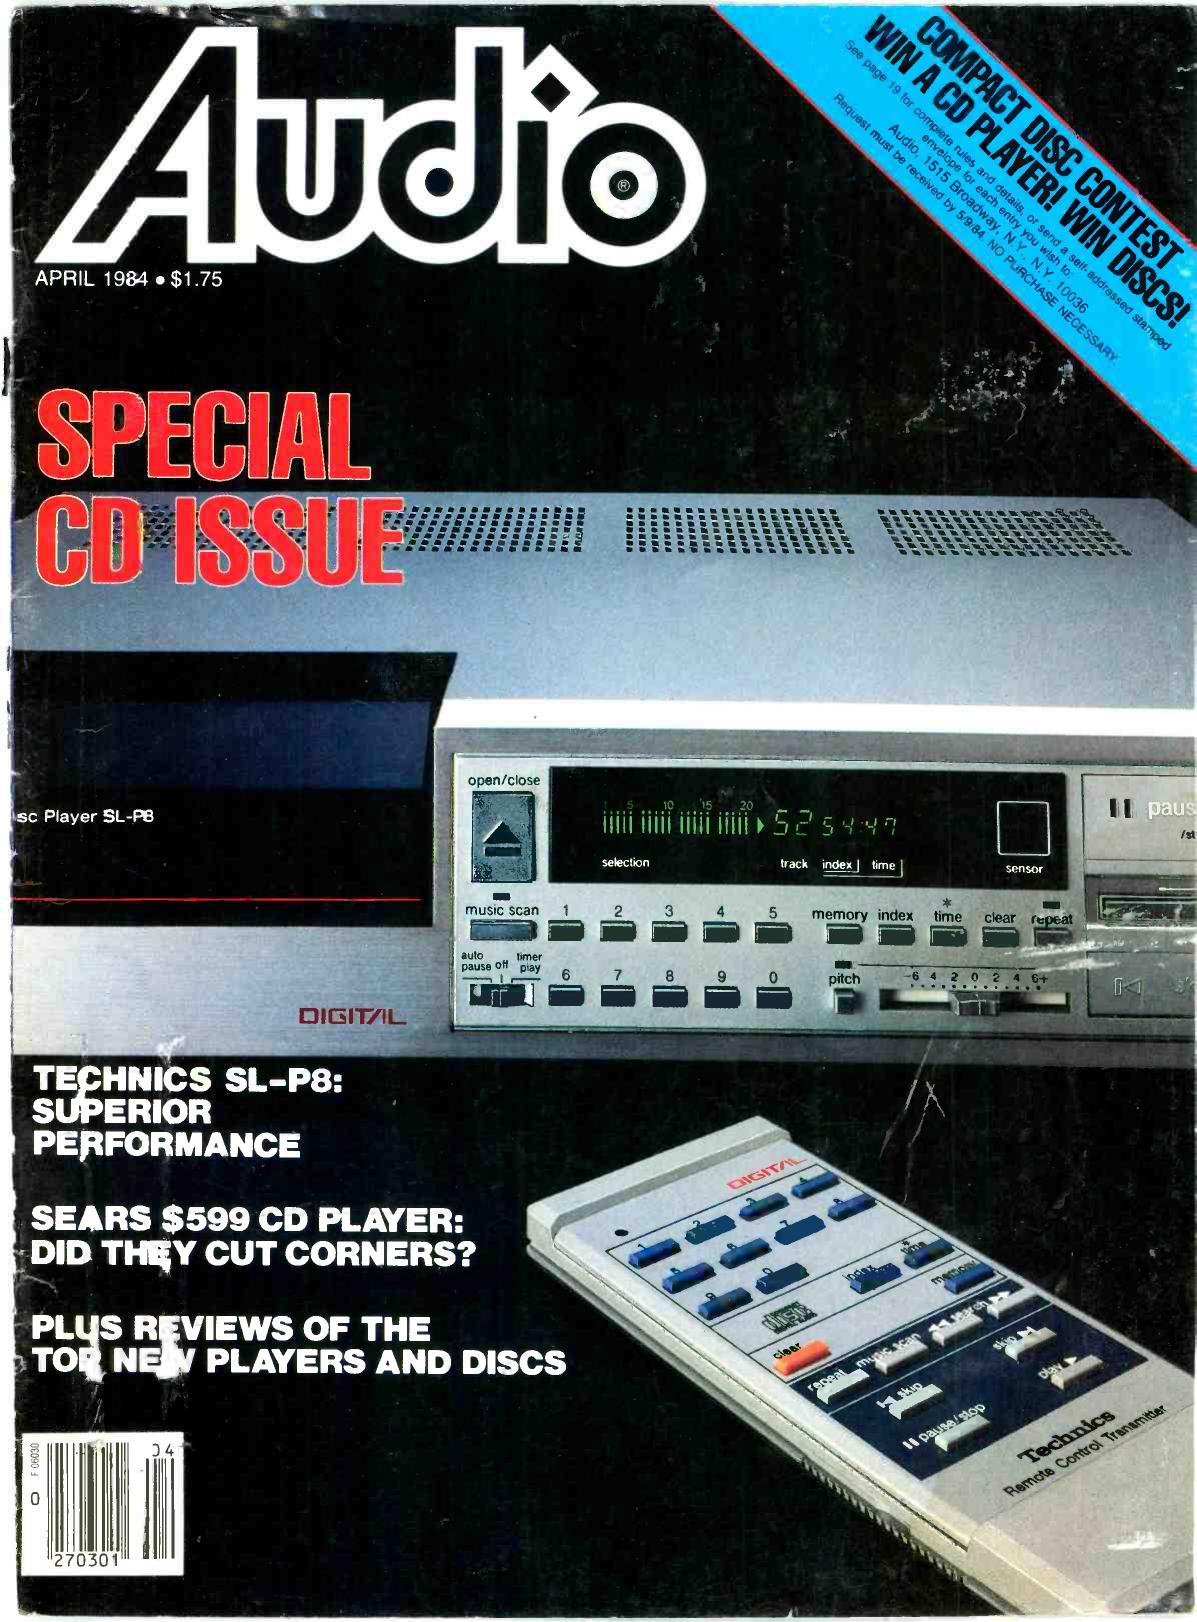 Panasonic SL-P3500 Black Home Audio Video Digital Single Compact Disc CD Player